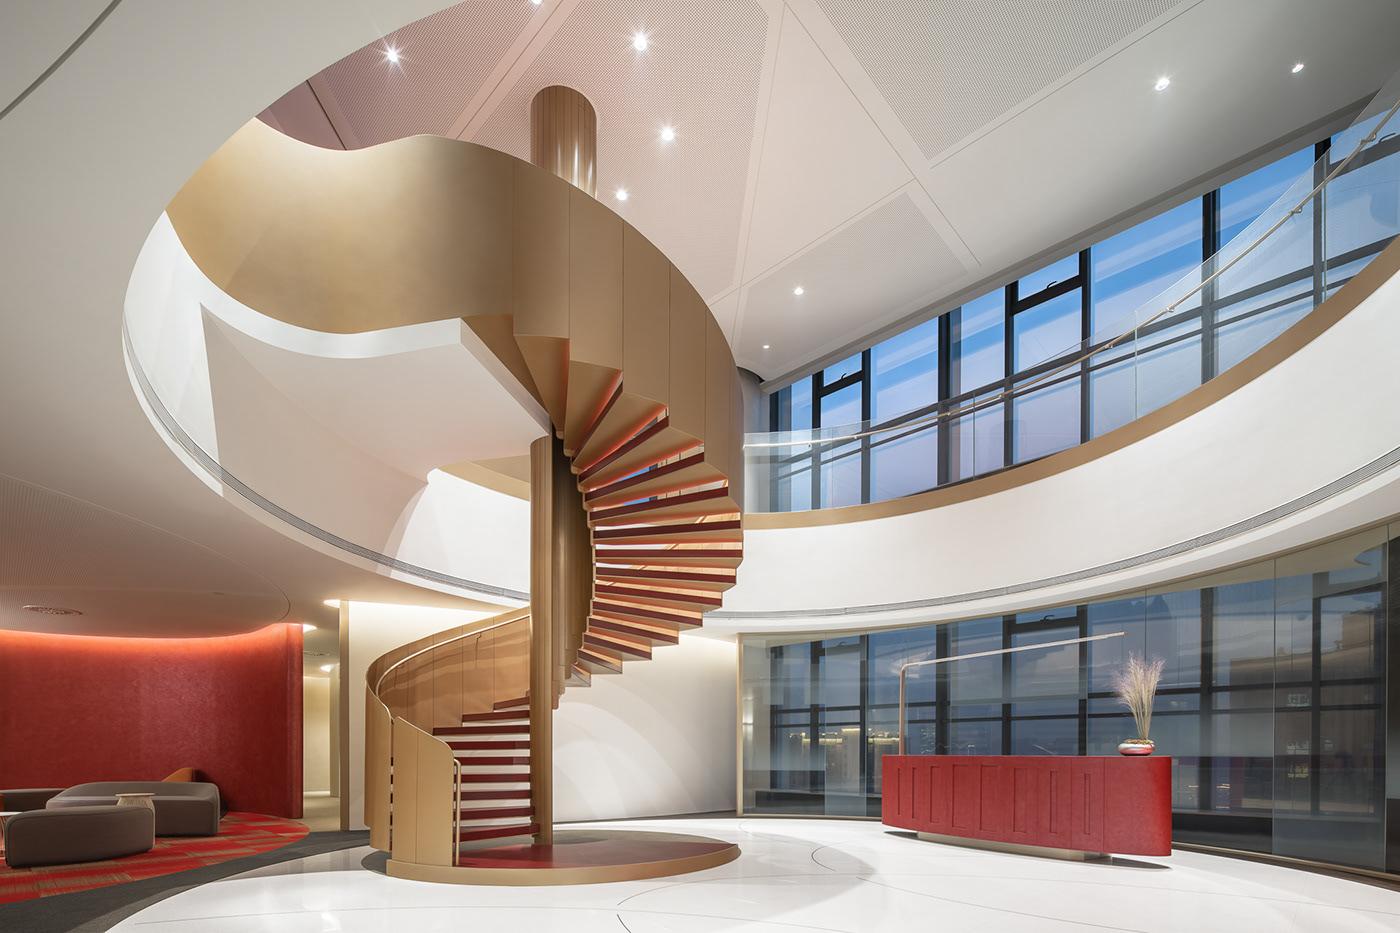 CHINLINK interior design  Office Photography  HONG Designworks studio TEN Tan xiao xi'an